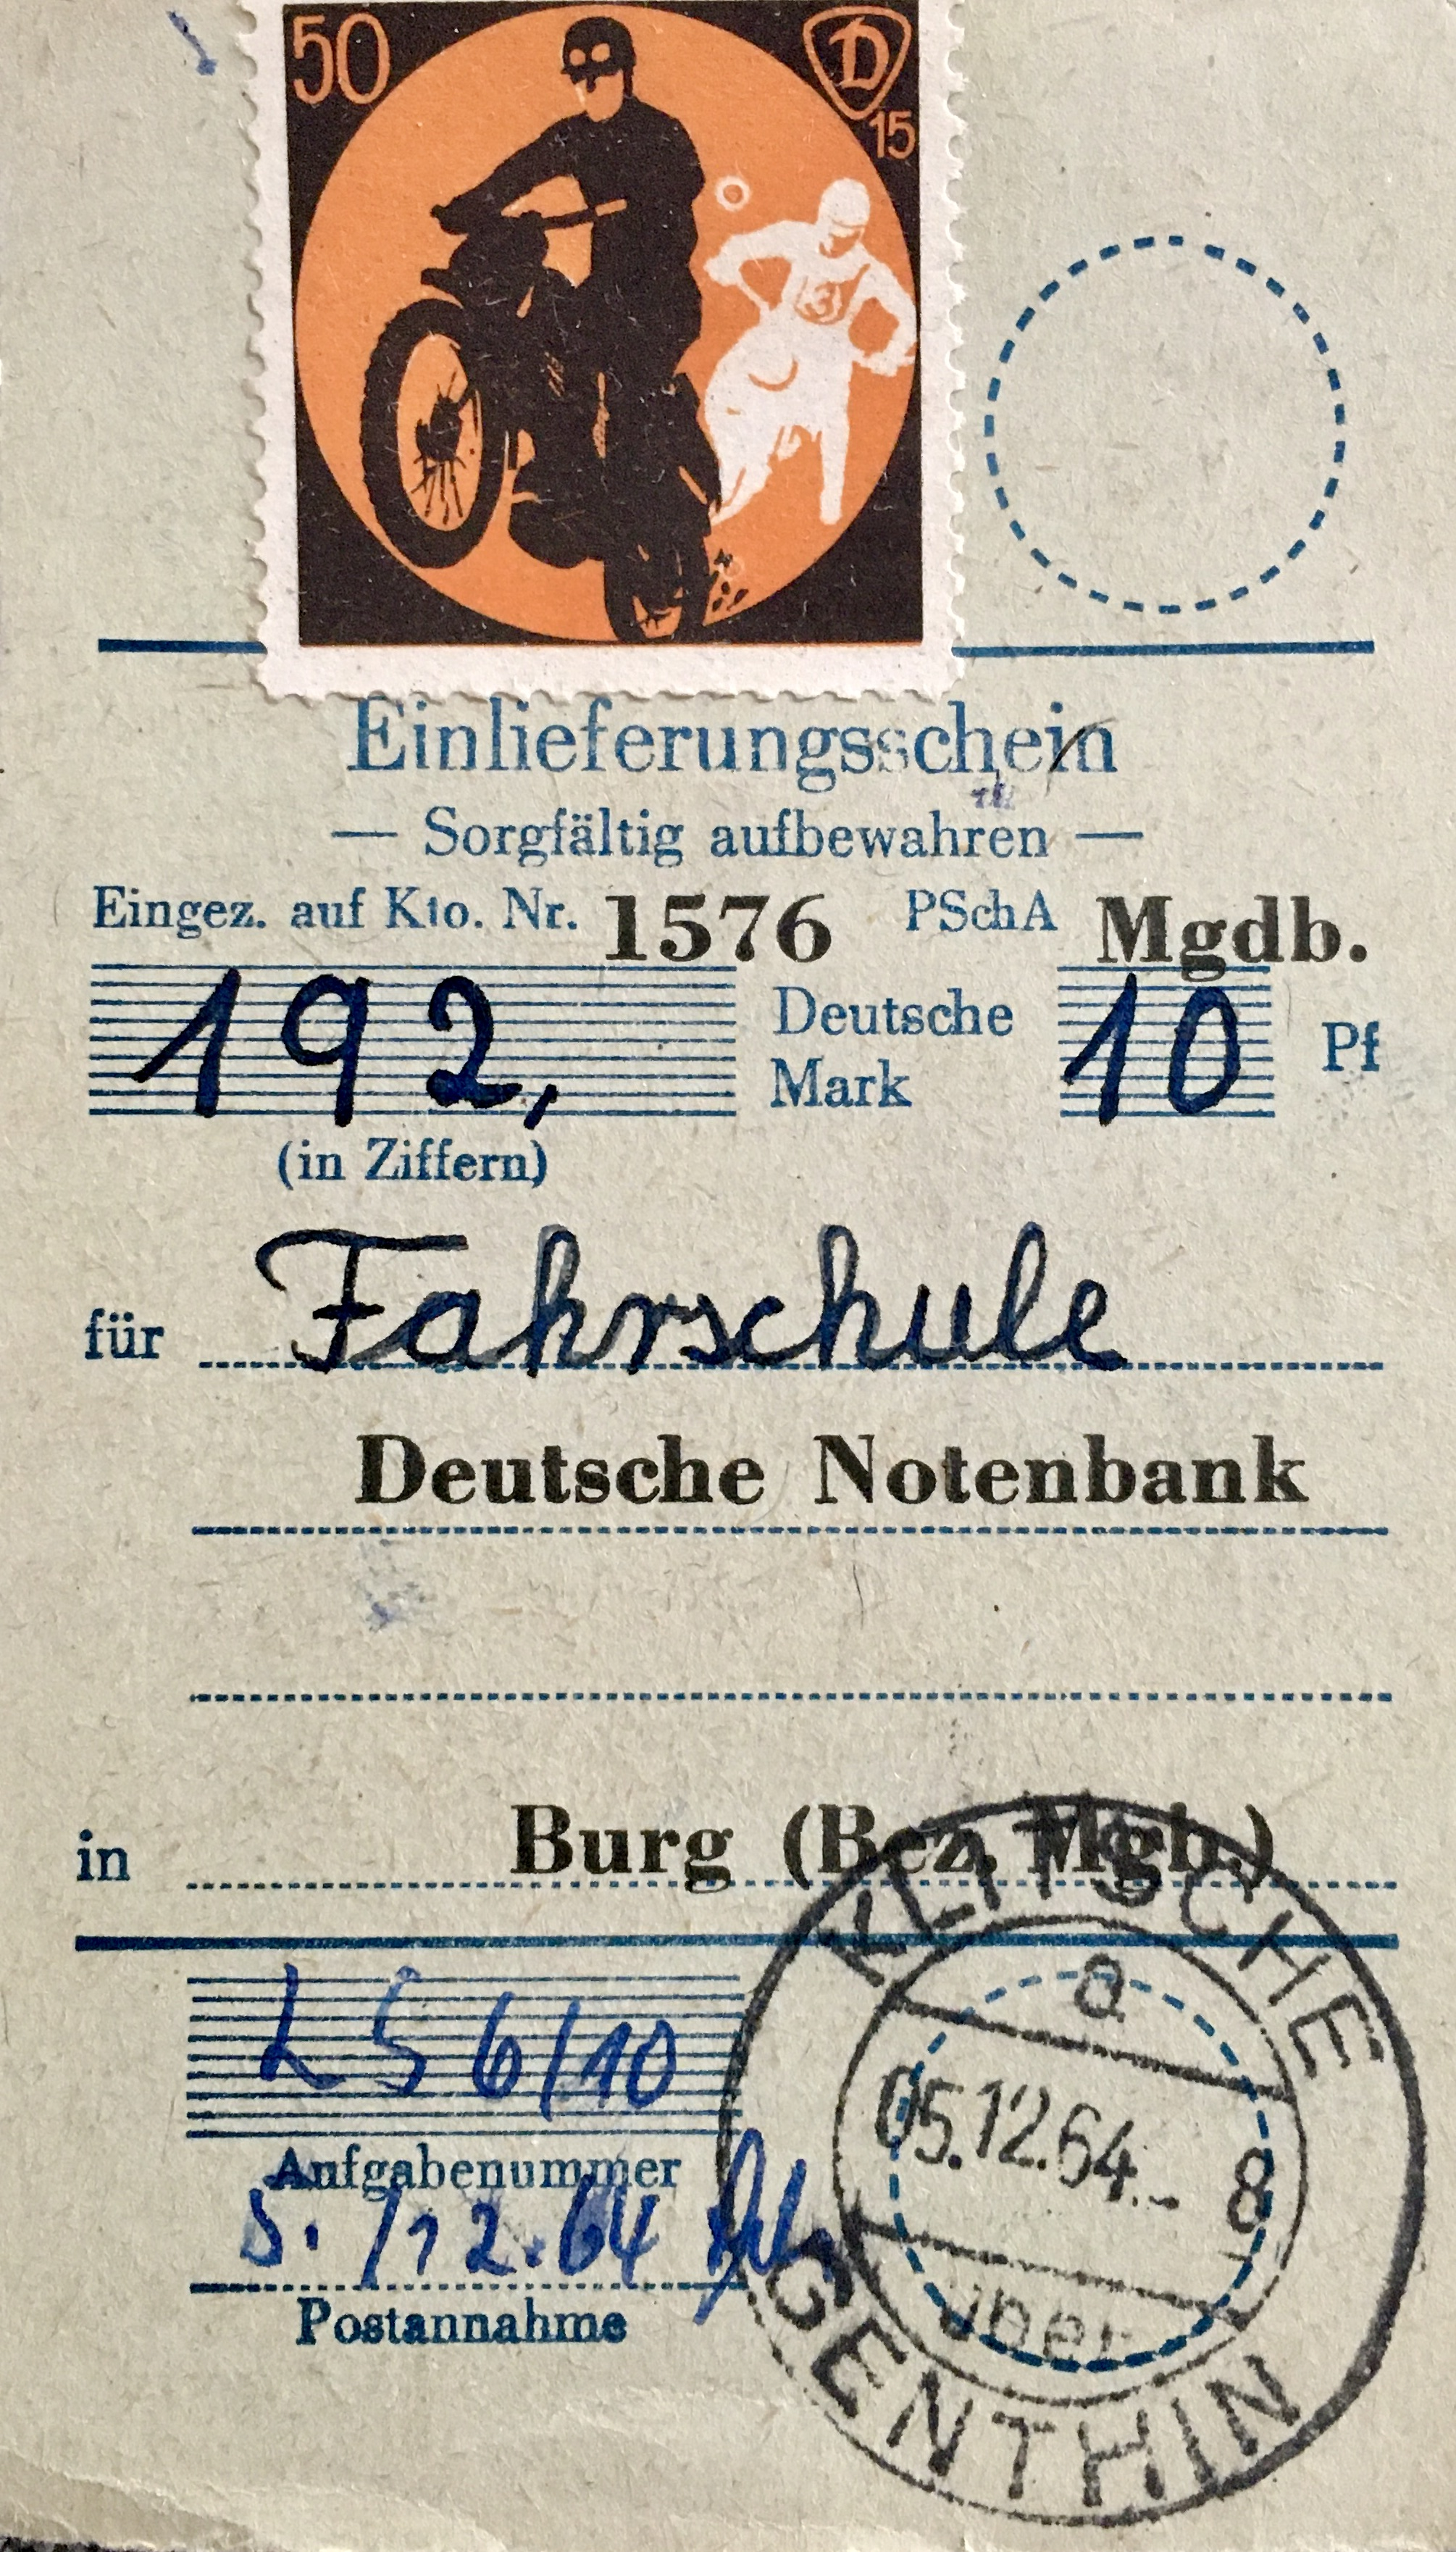 Fahrschule DDR